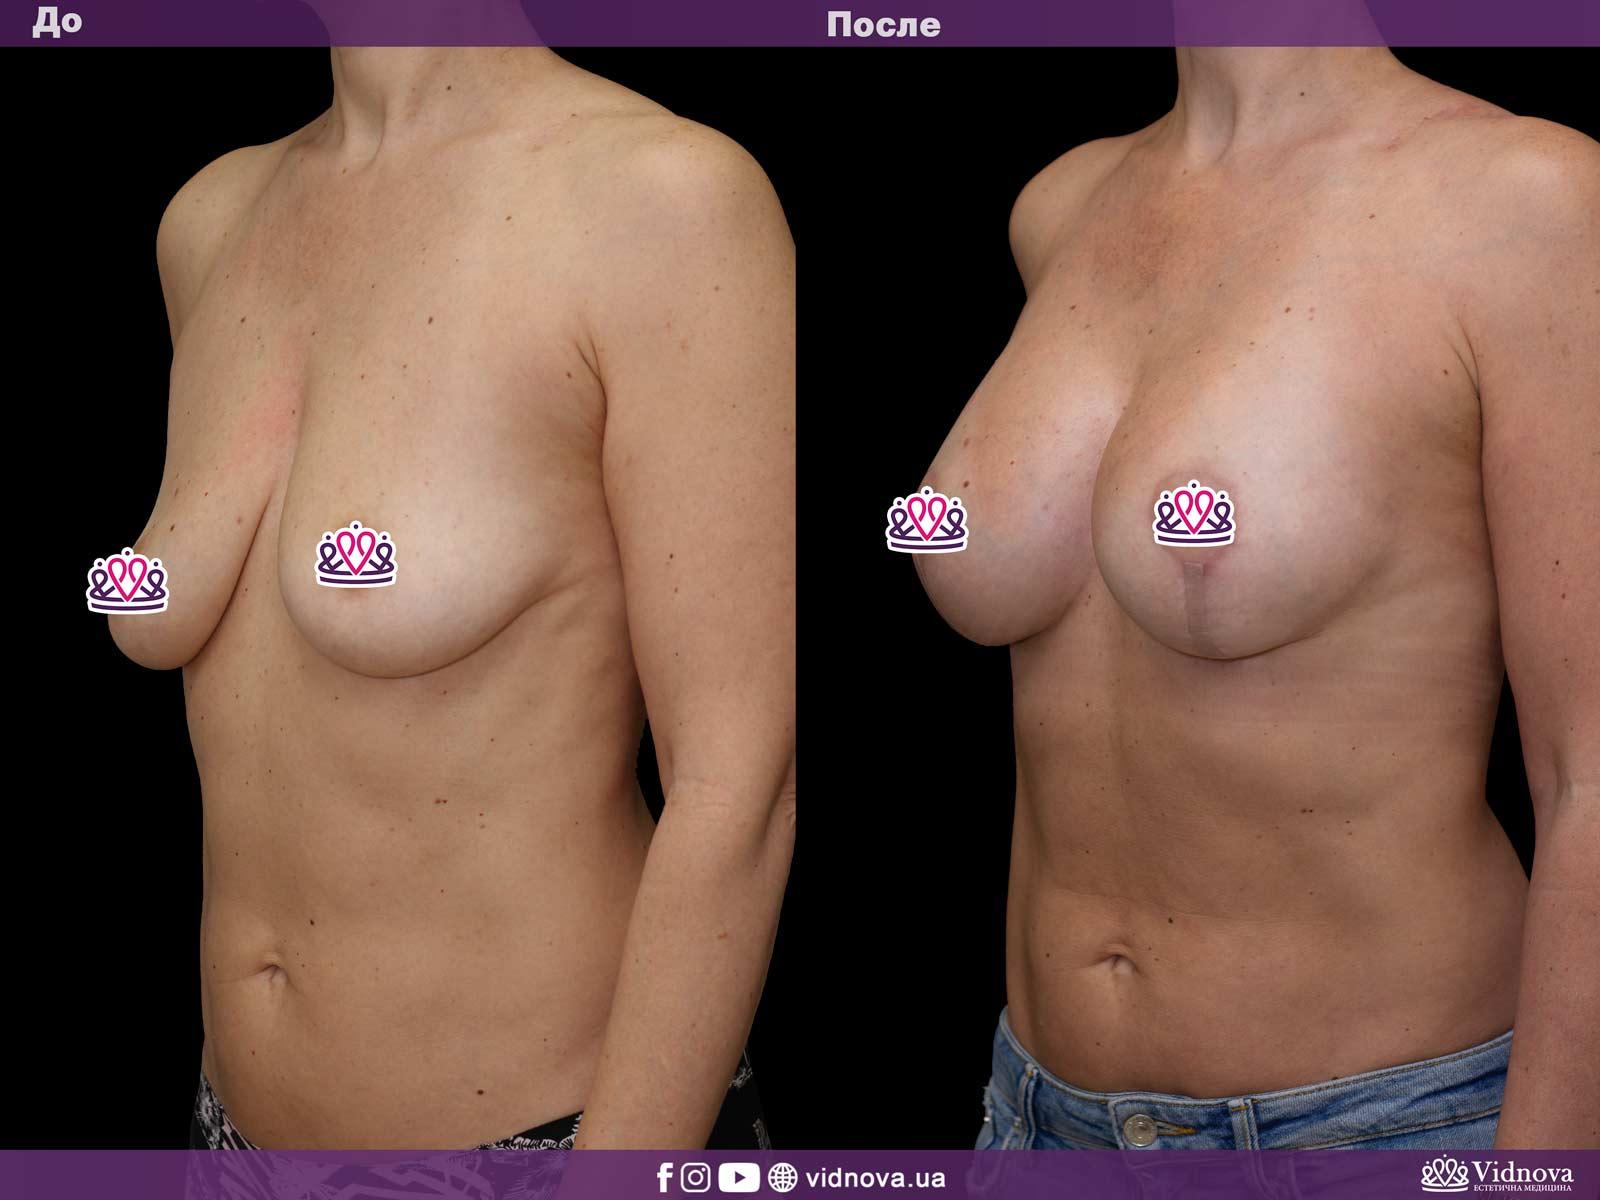 Подтяжка груди: Фото ДО и ПОСЛЕ - Пример №7-2 - Клиника Vidnova